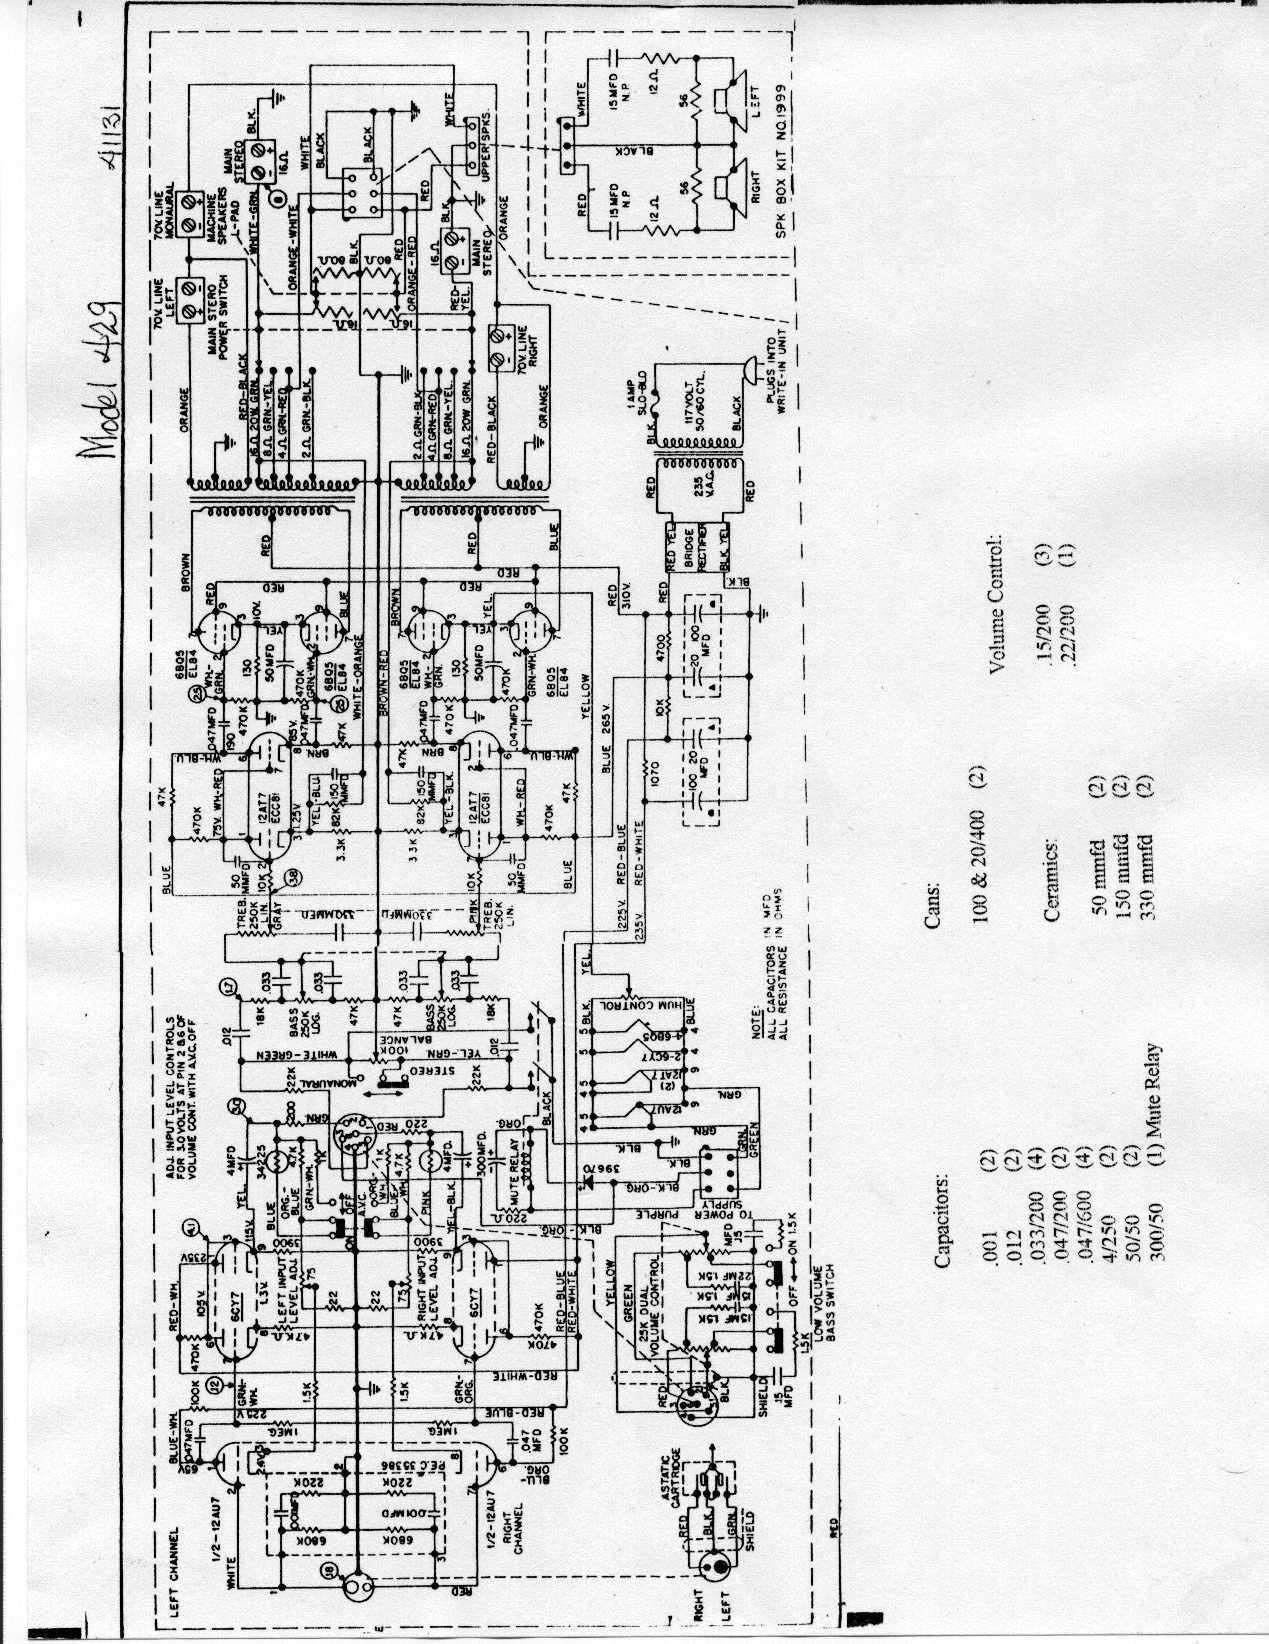 [Jukebox-list] wiring diagram for amplifier 41056-A (Rock